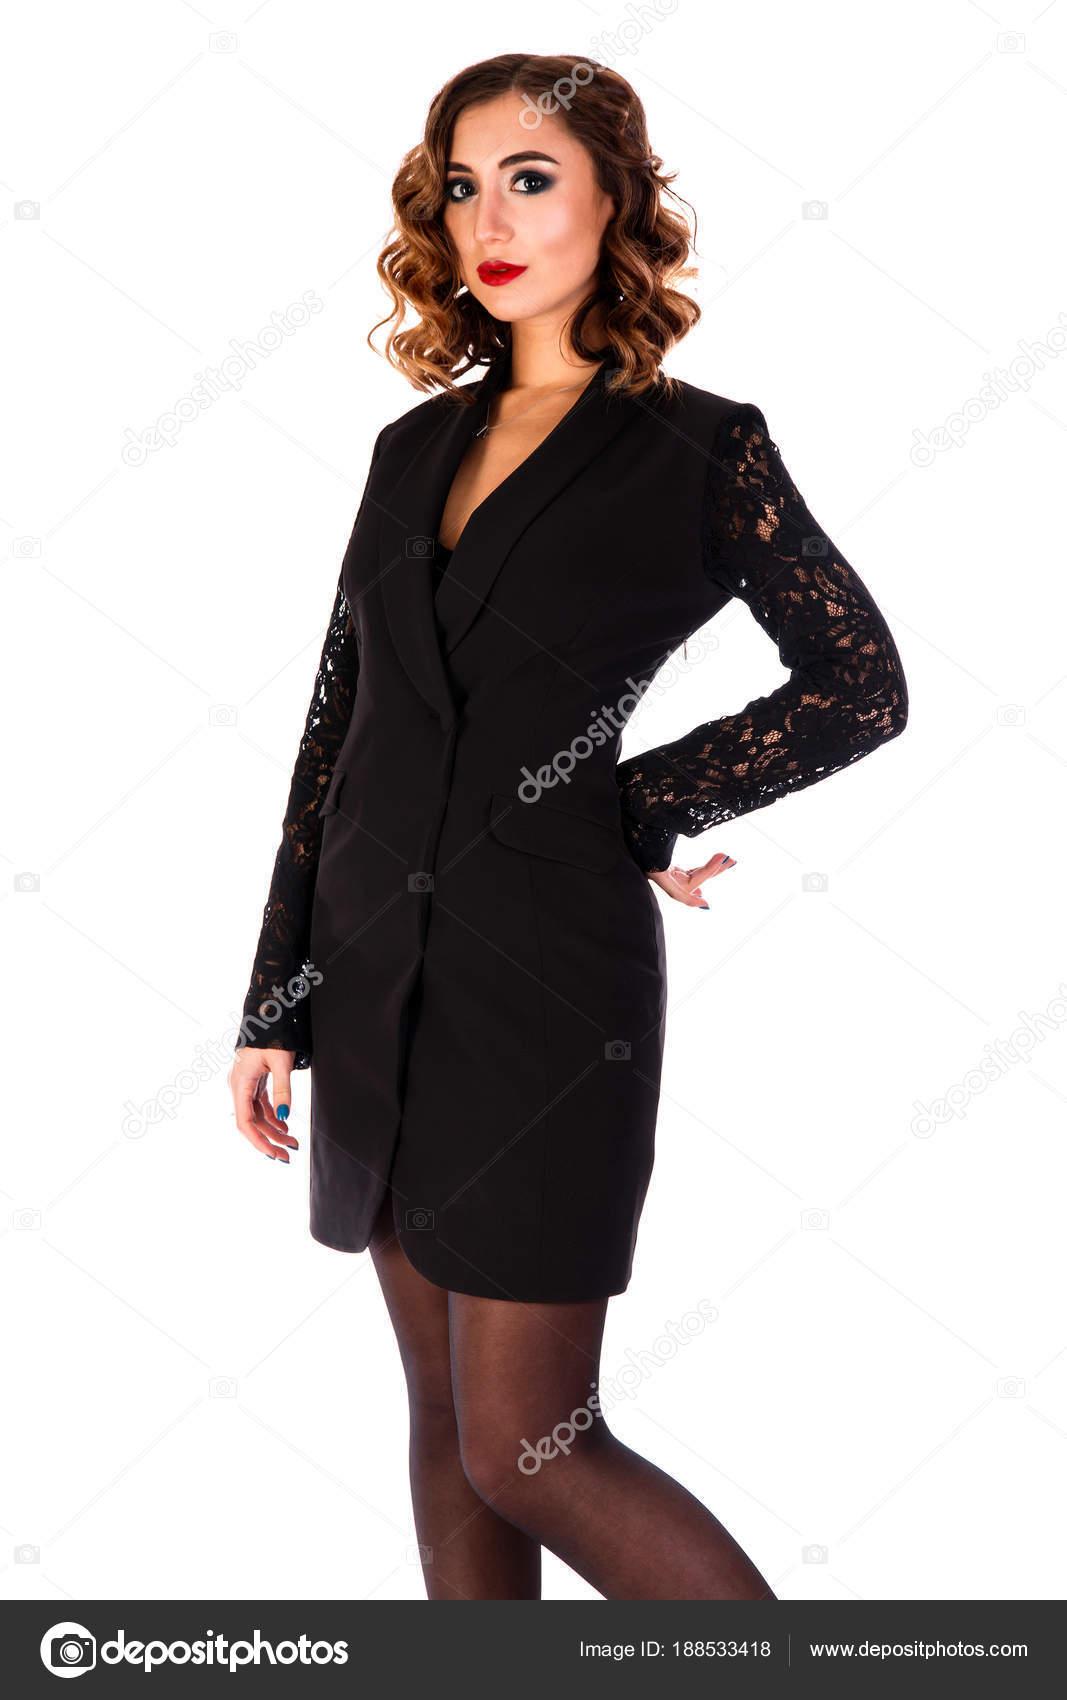 100c25671f40 Όμορφη Νεαρή Γυναίκα Ένα Κοντό Μαύρο Φόρεμα Που Απομονώνονται Λευκό —  Φωτογραφία Αρχείου